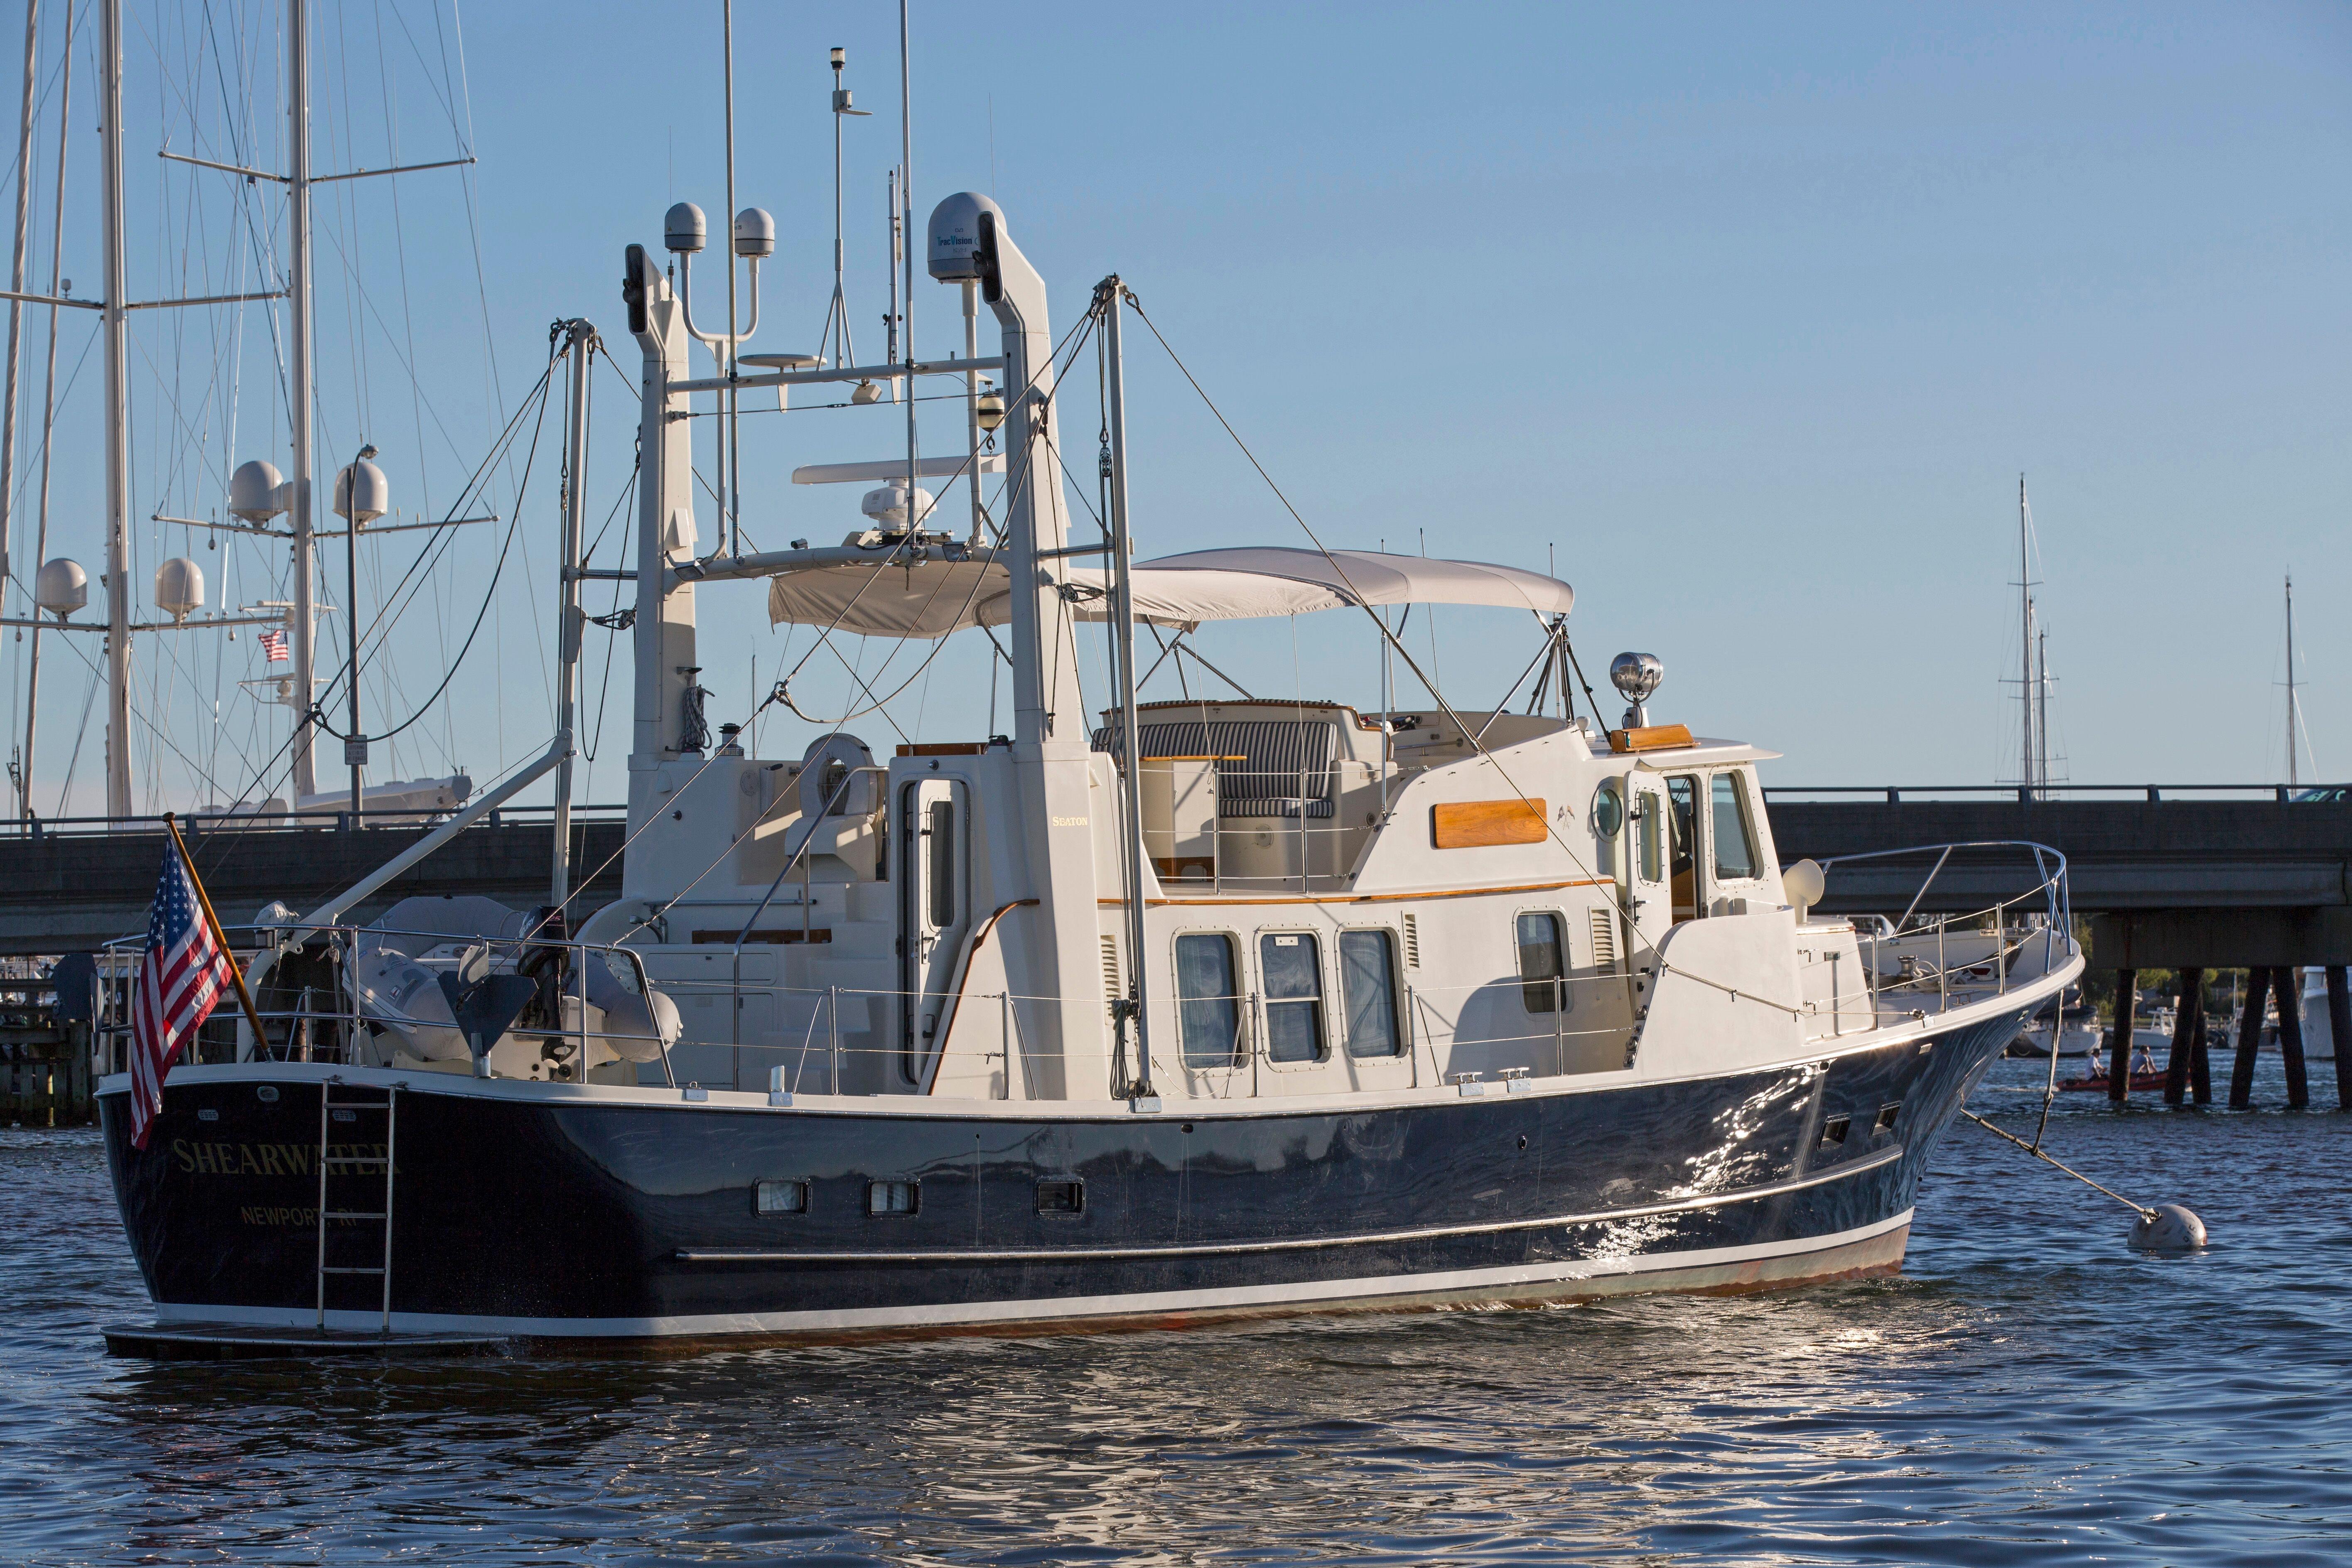 Boat Lift Motor Wiring Diagrams Baldor Lt 310 - Auto Electrical ...